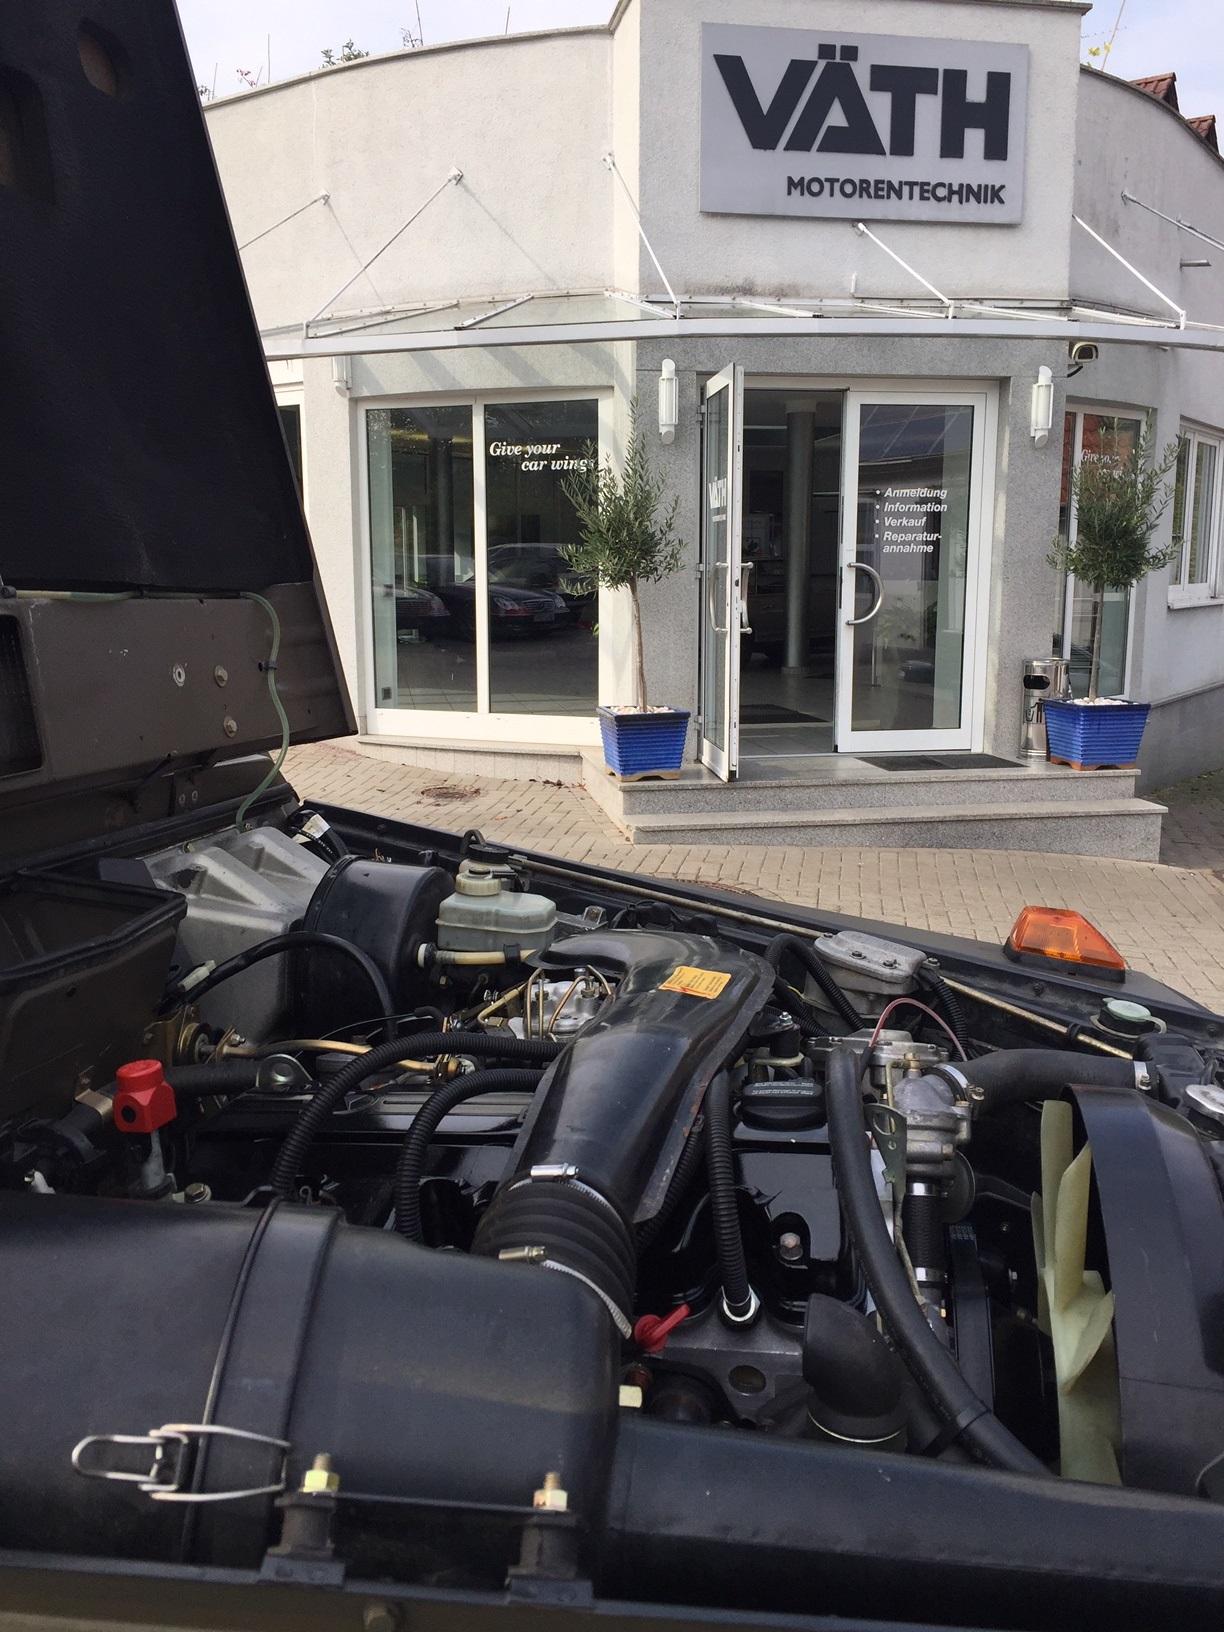 Motor, Mercedes Puch 230GE Motorumbau auf 2,5 Liter Hubraum